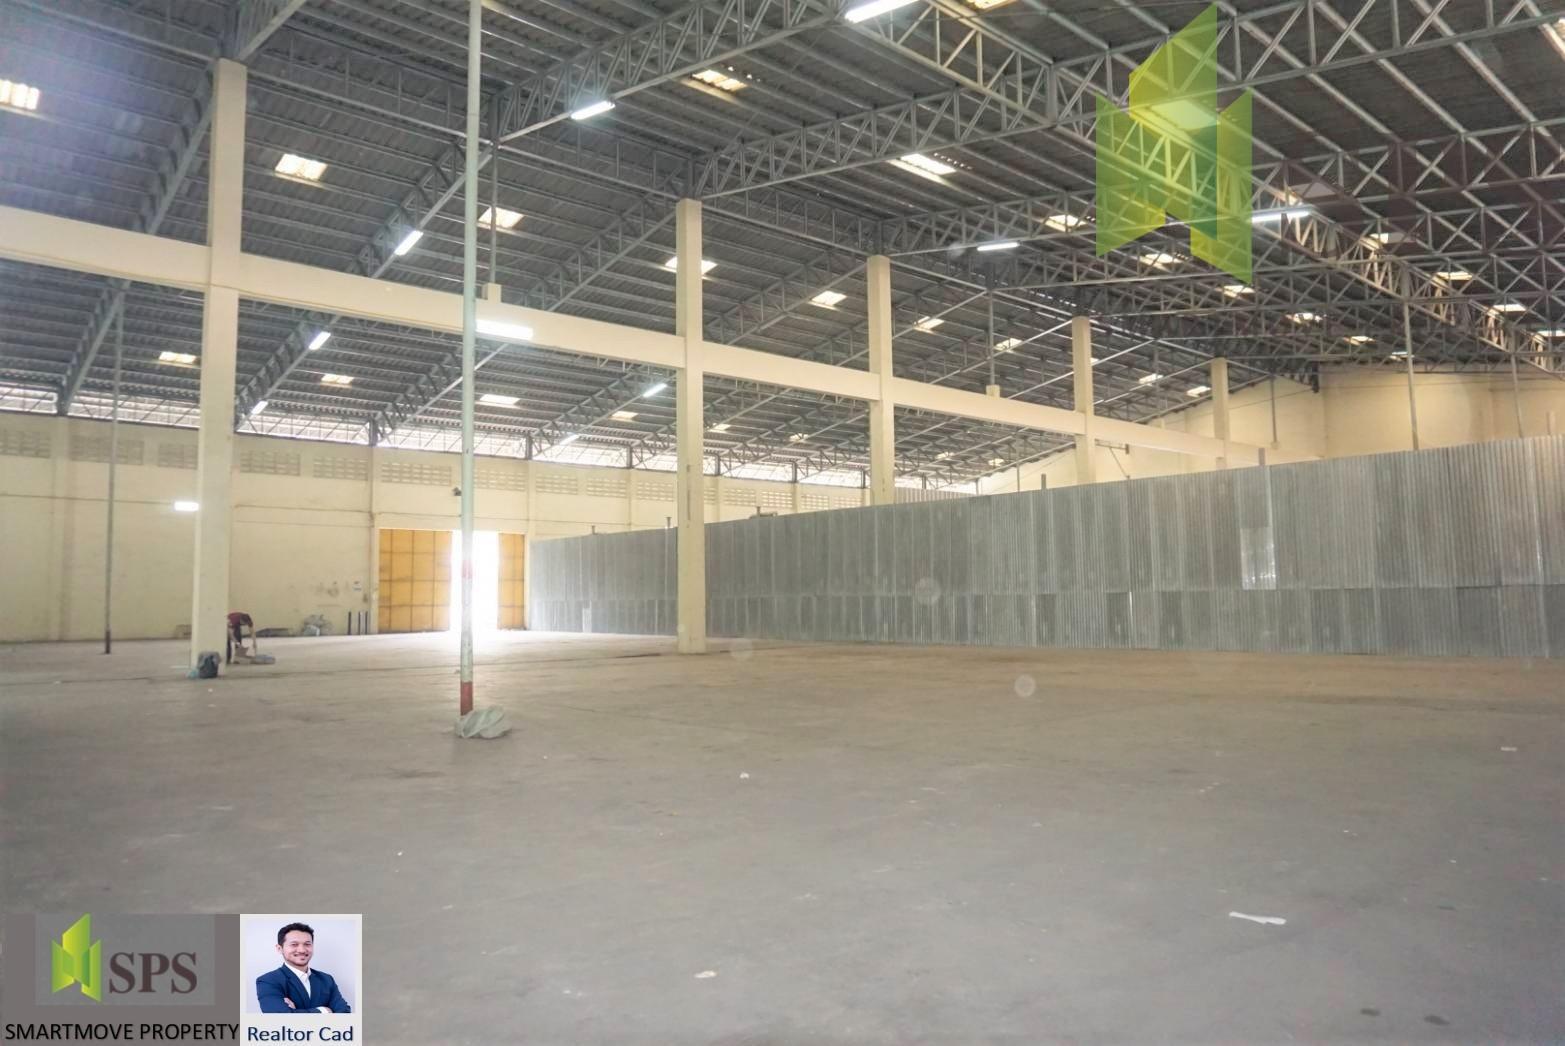 FOR RENT Warehouse in Rama 3 (Realtor Cad) โกดังพระราม 3 เดินทางสะดวกไปท่าเรือคลองเตย (SPSCS-092)